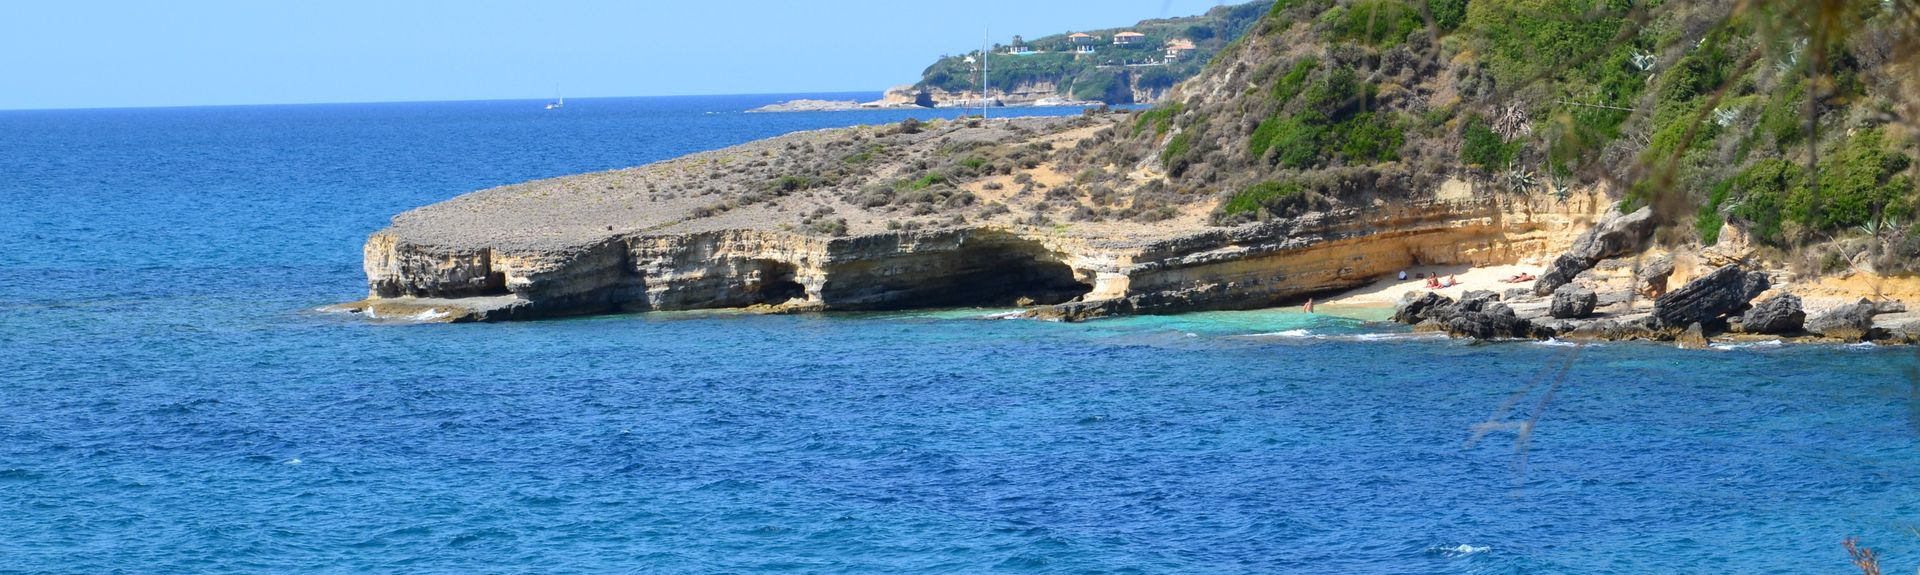 Sarlata, Peloponnese, West Greece and Ionian Sea, Greece